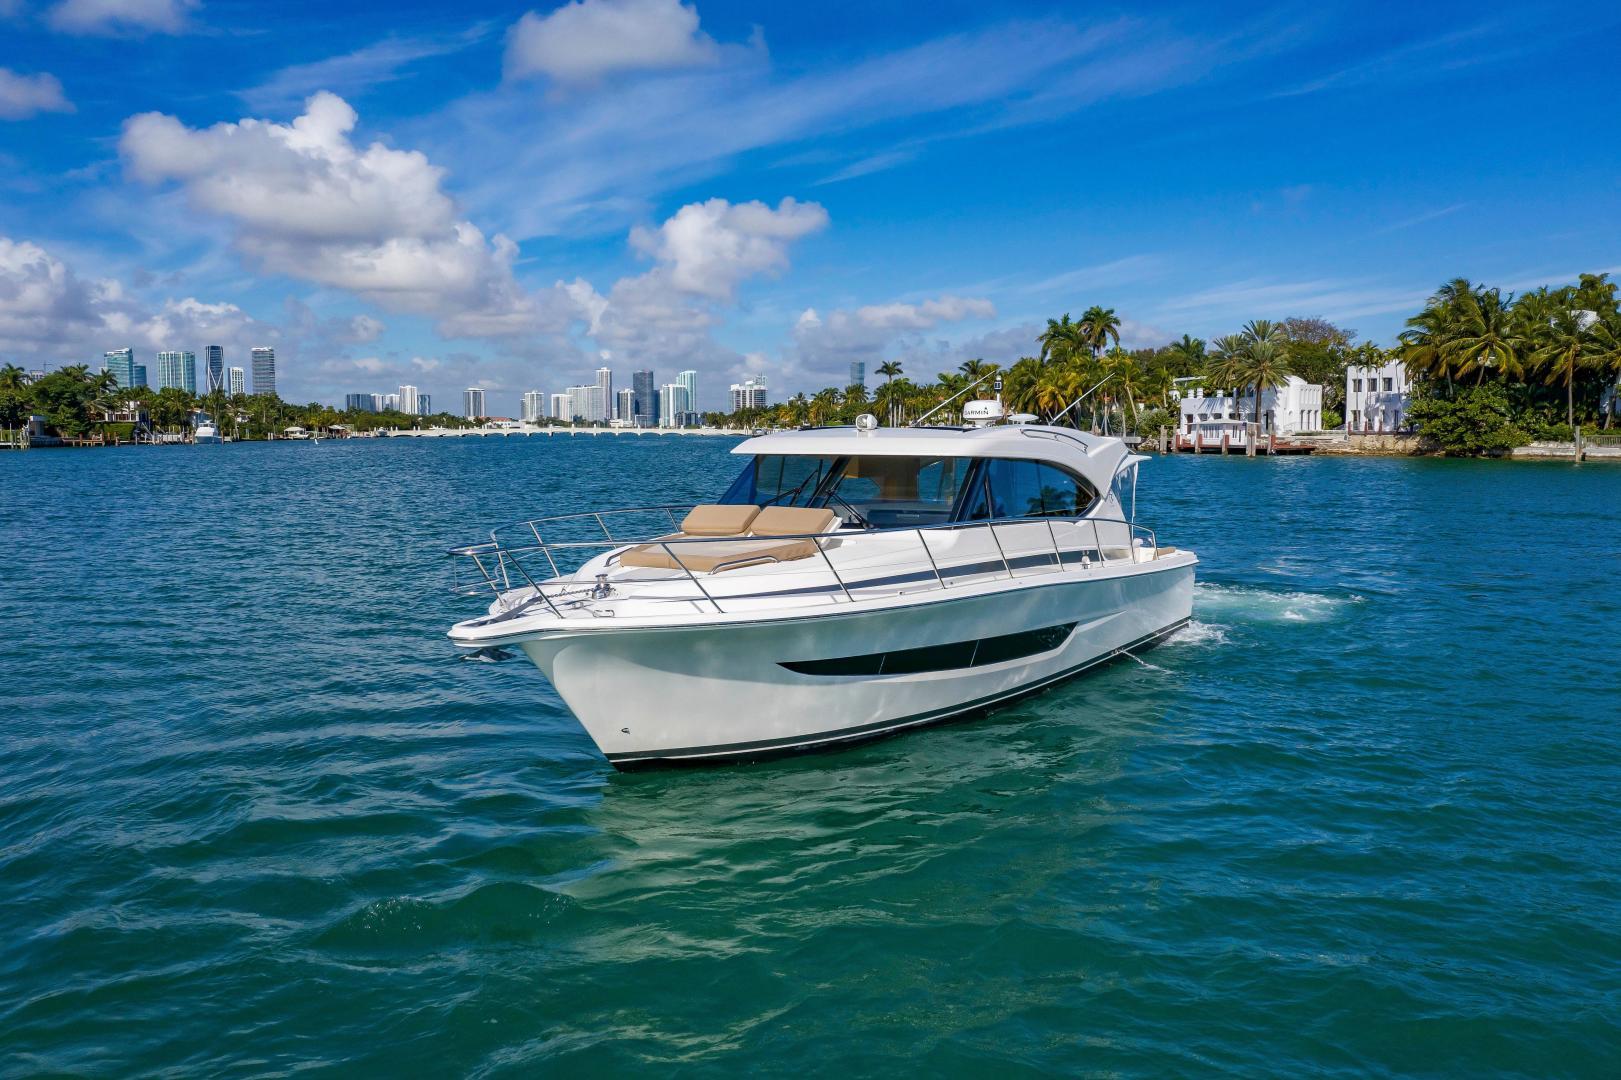 Riviera-395 SUV 2019-Ipanema Miami Beach-Florida-United States-1614865   Thumbnail